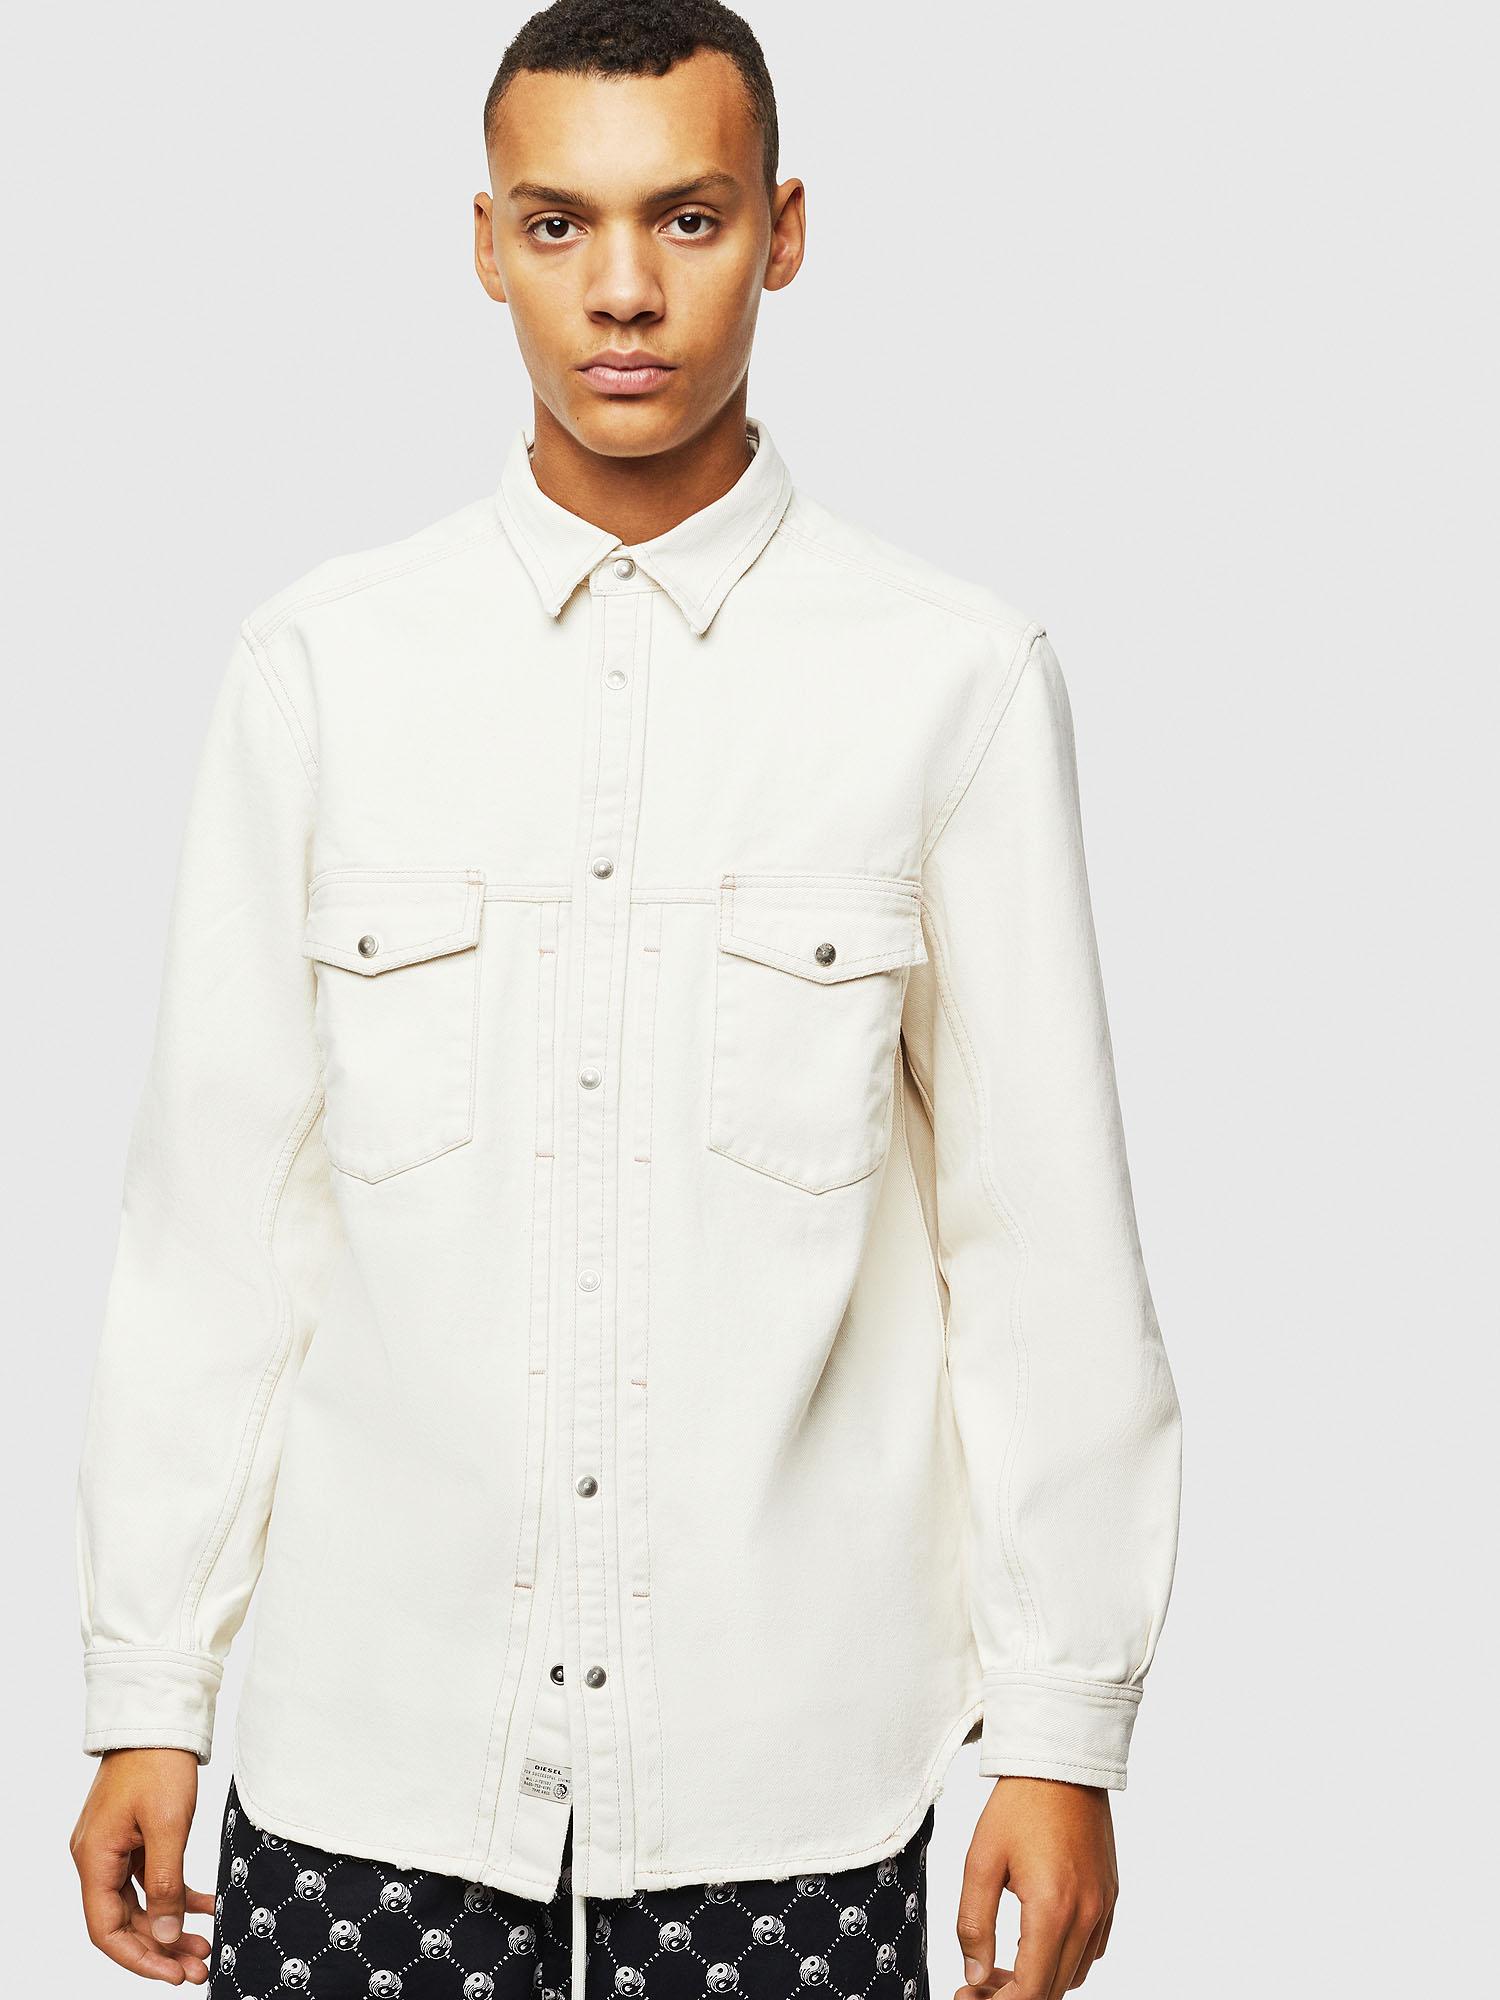 Diesel Denim Shirts 0HAWA - White - L